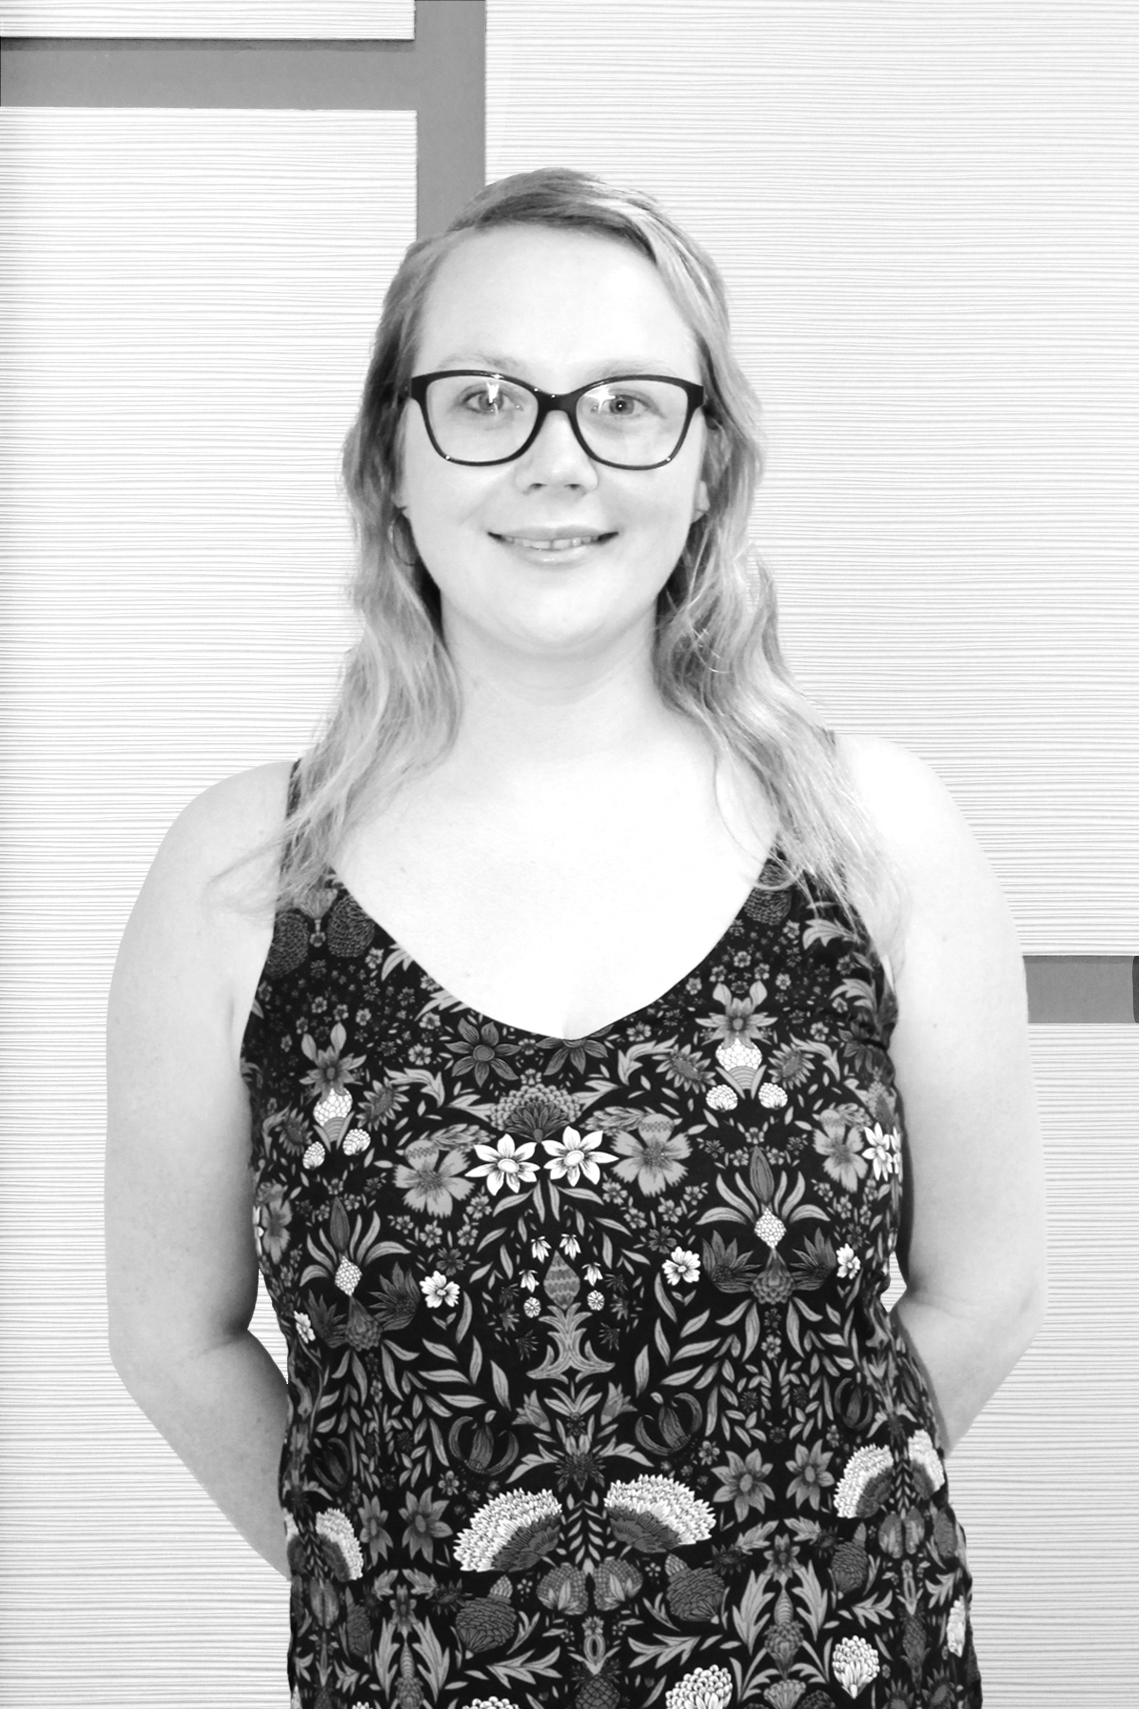 Centre_Manager_ Rondebosch_Jessica_Olsen